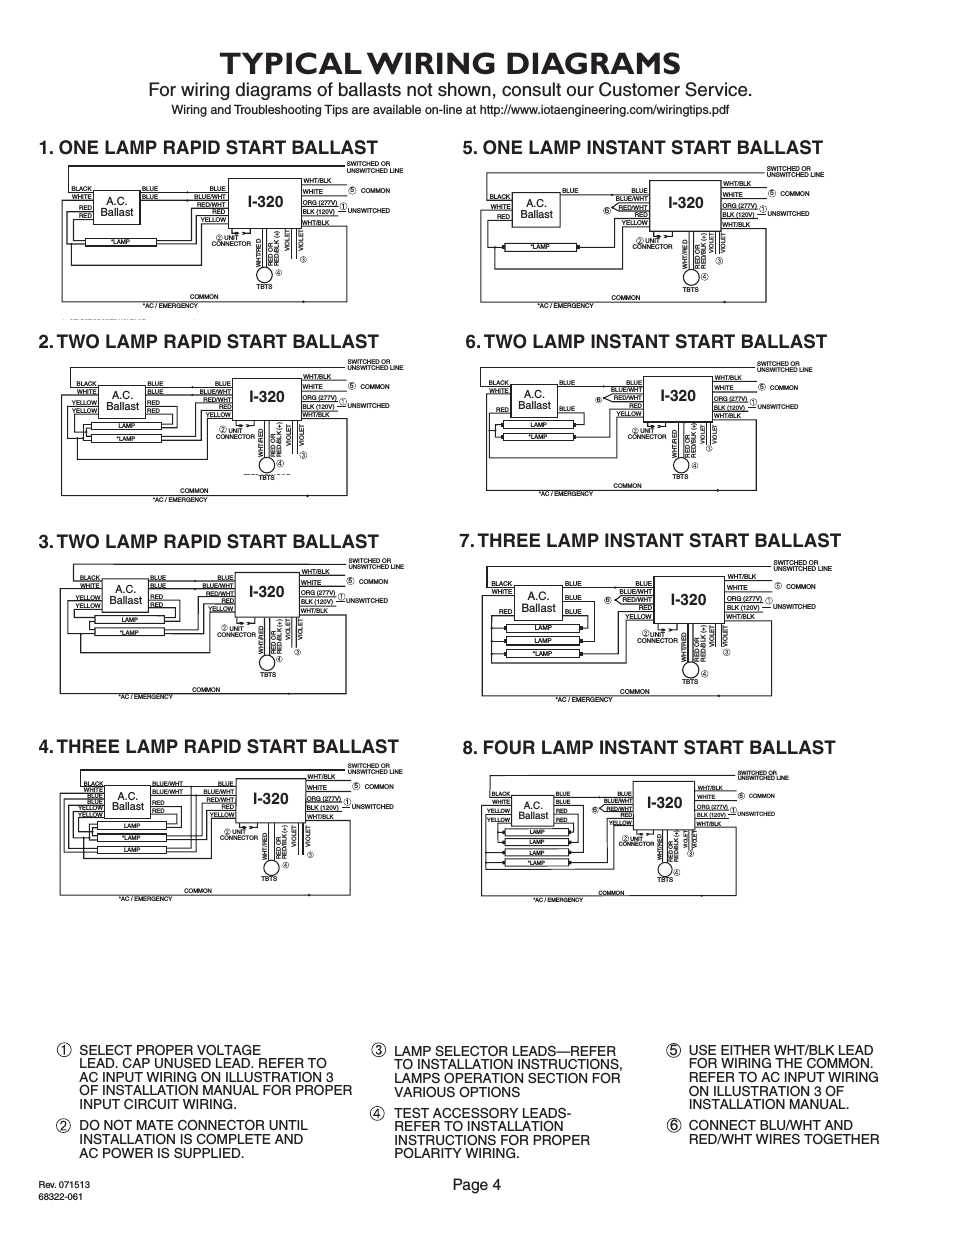 vc_9003] bodine b50 ballast wiring diagram wiring diagram  terch phon obenz wida tran kapemie mohammedshrine librar wiring 101